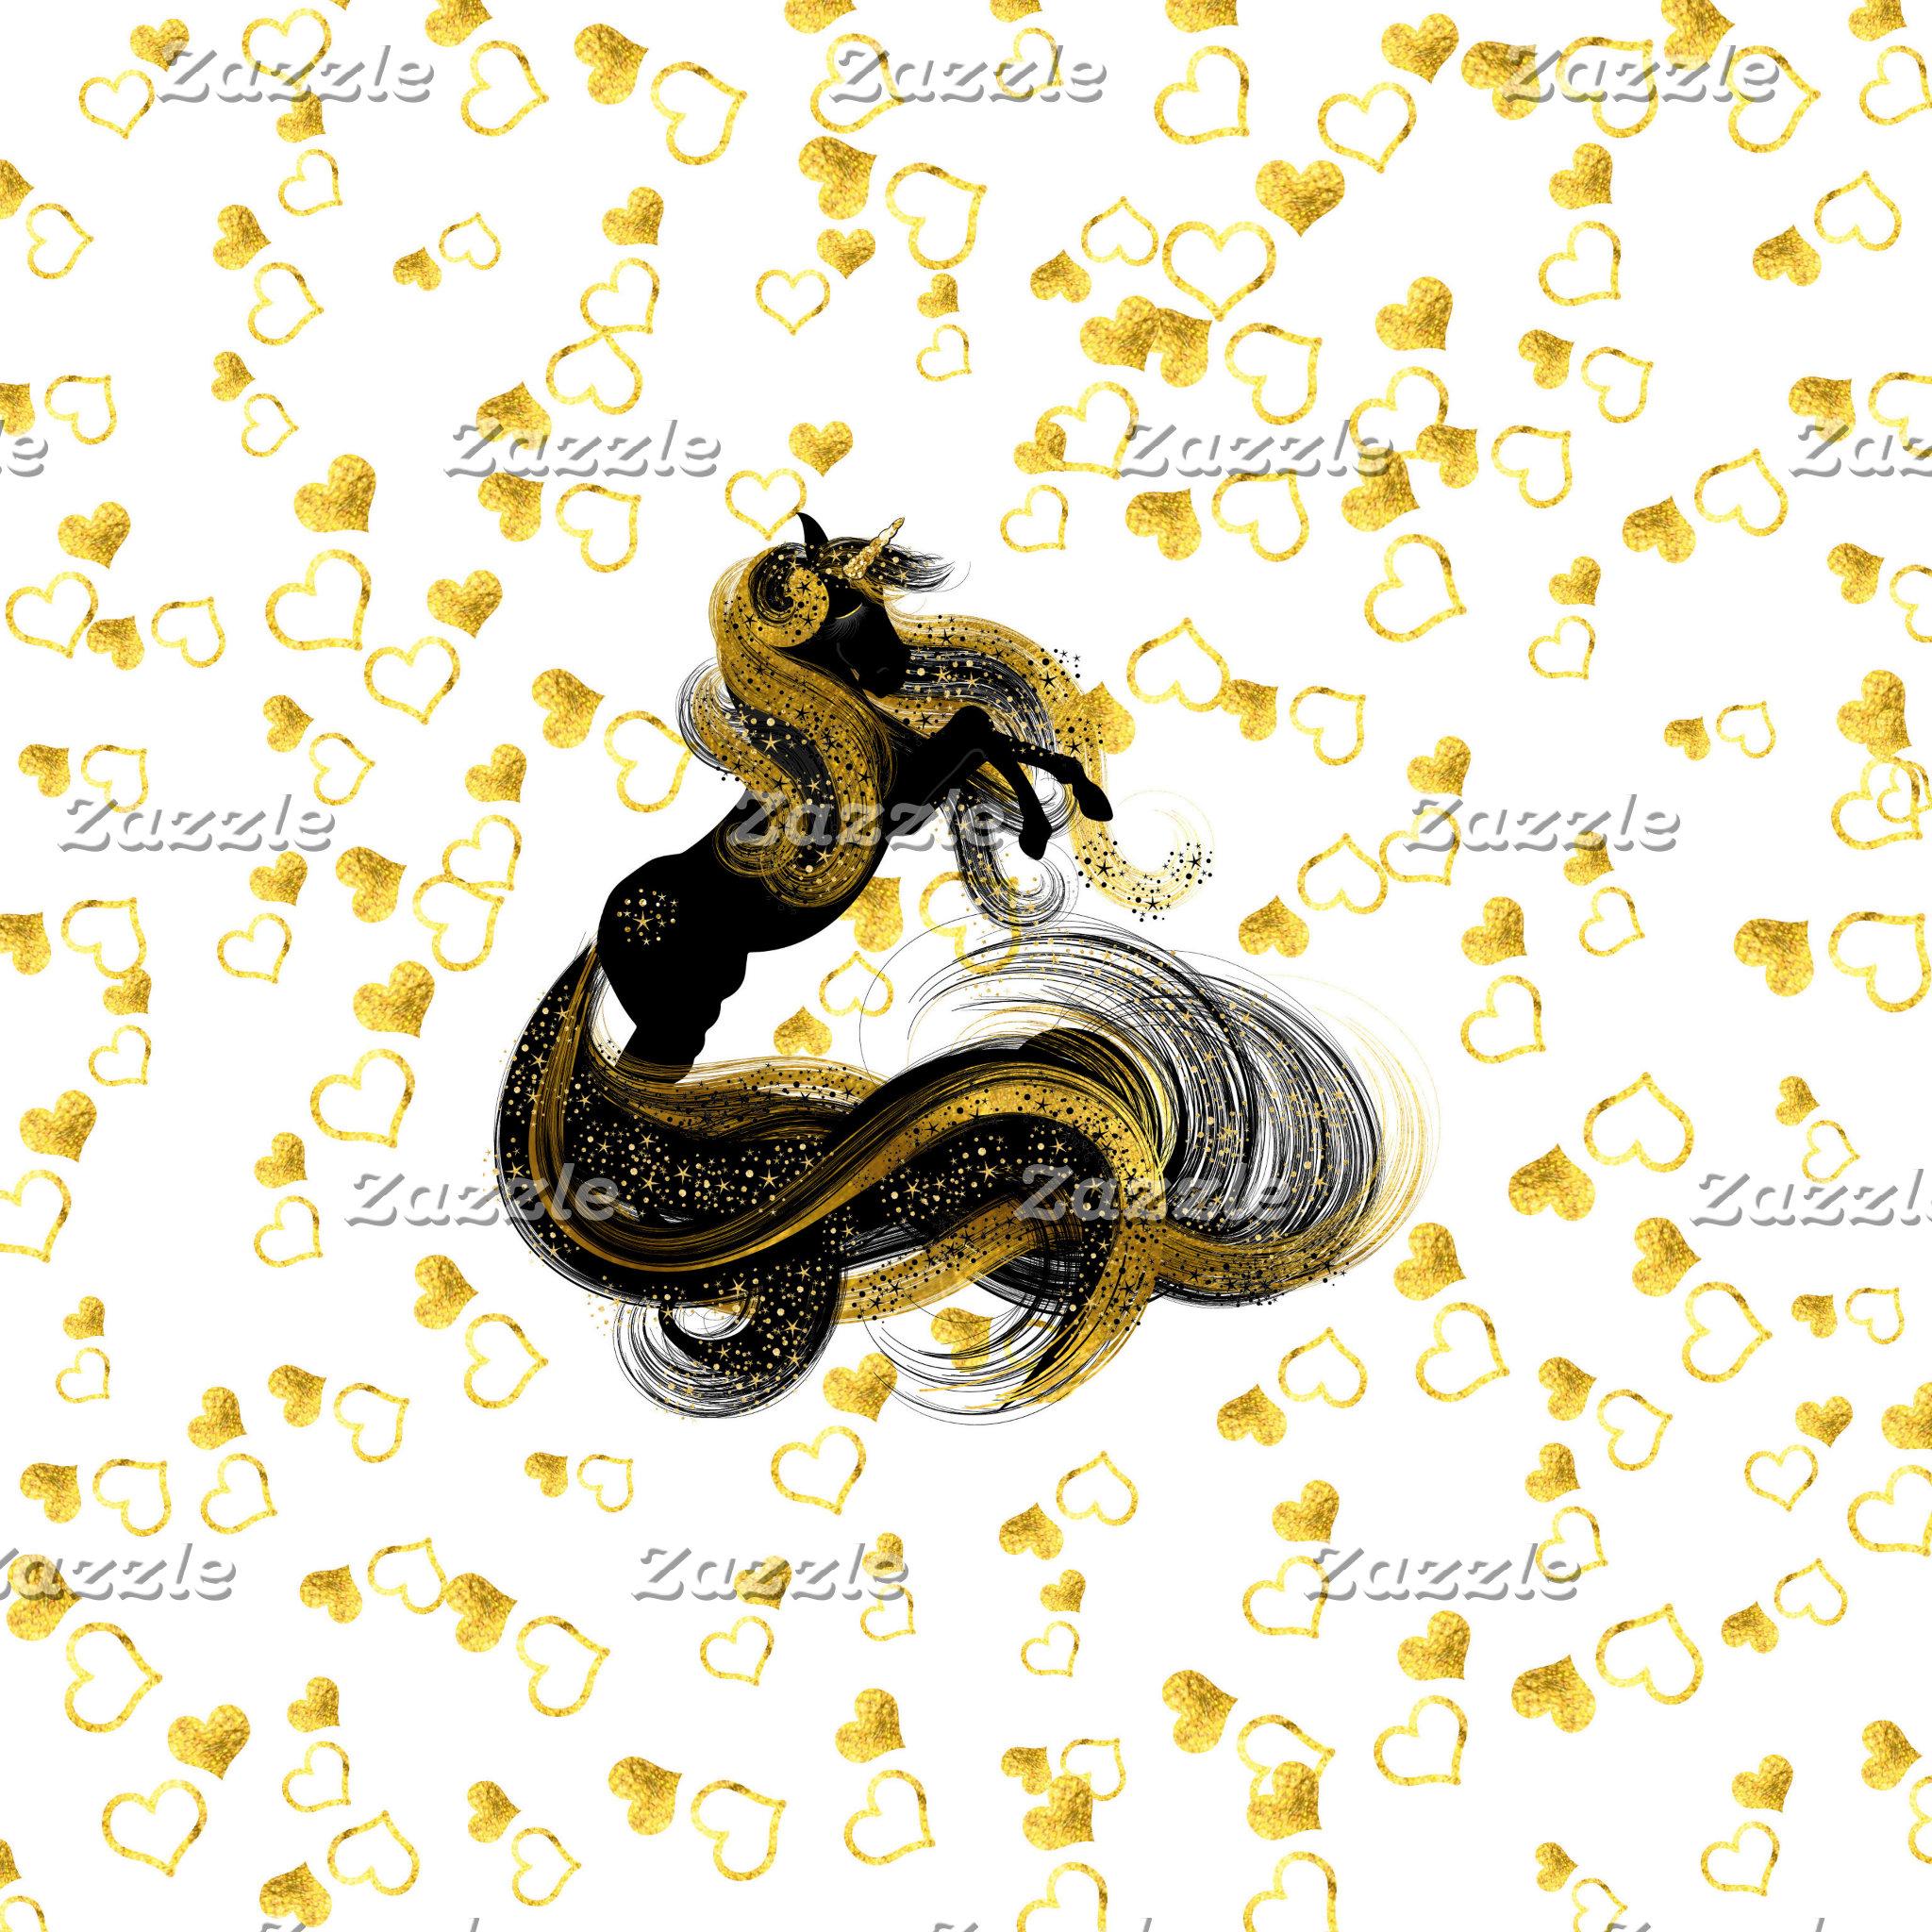 Gold & Black Magical Unicorns